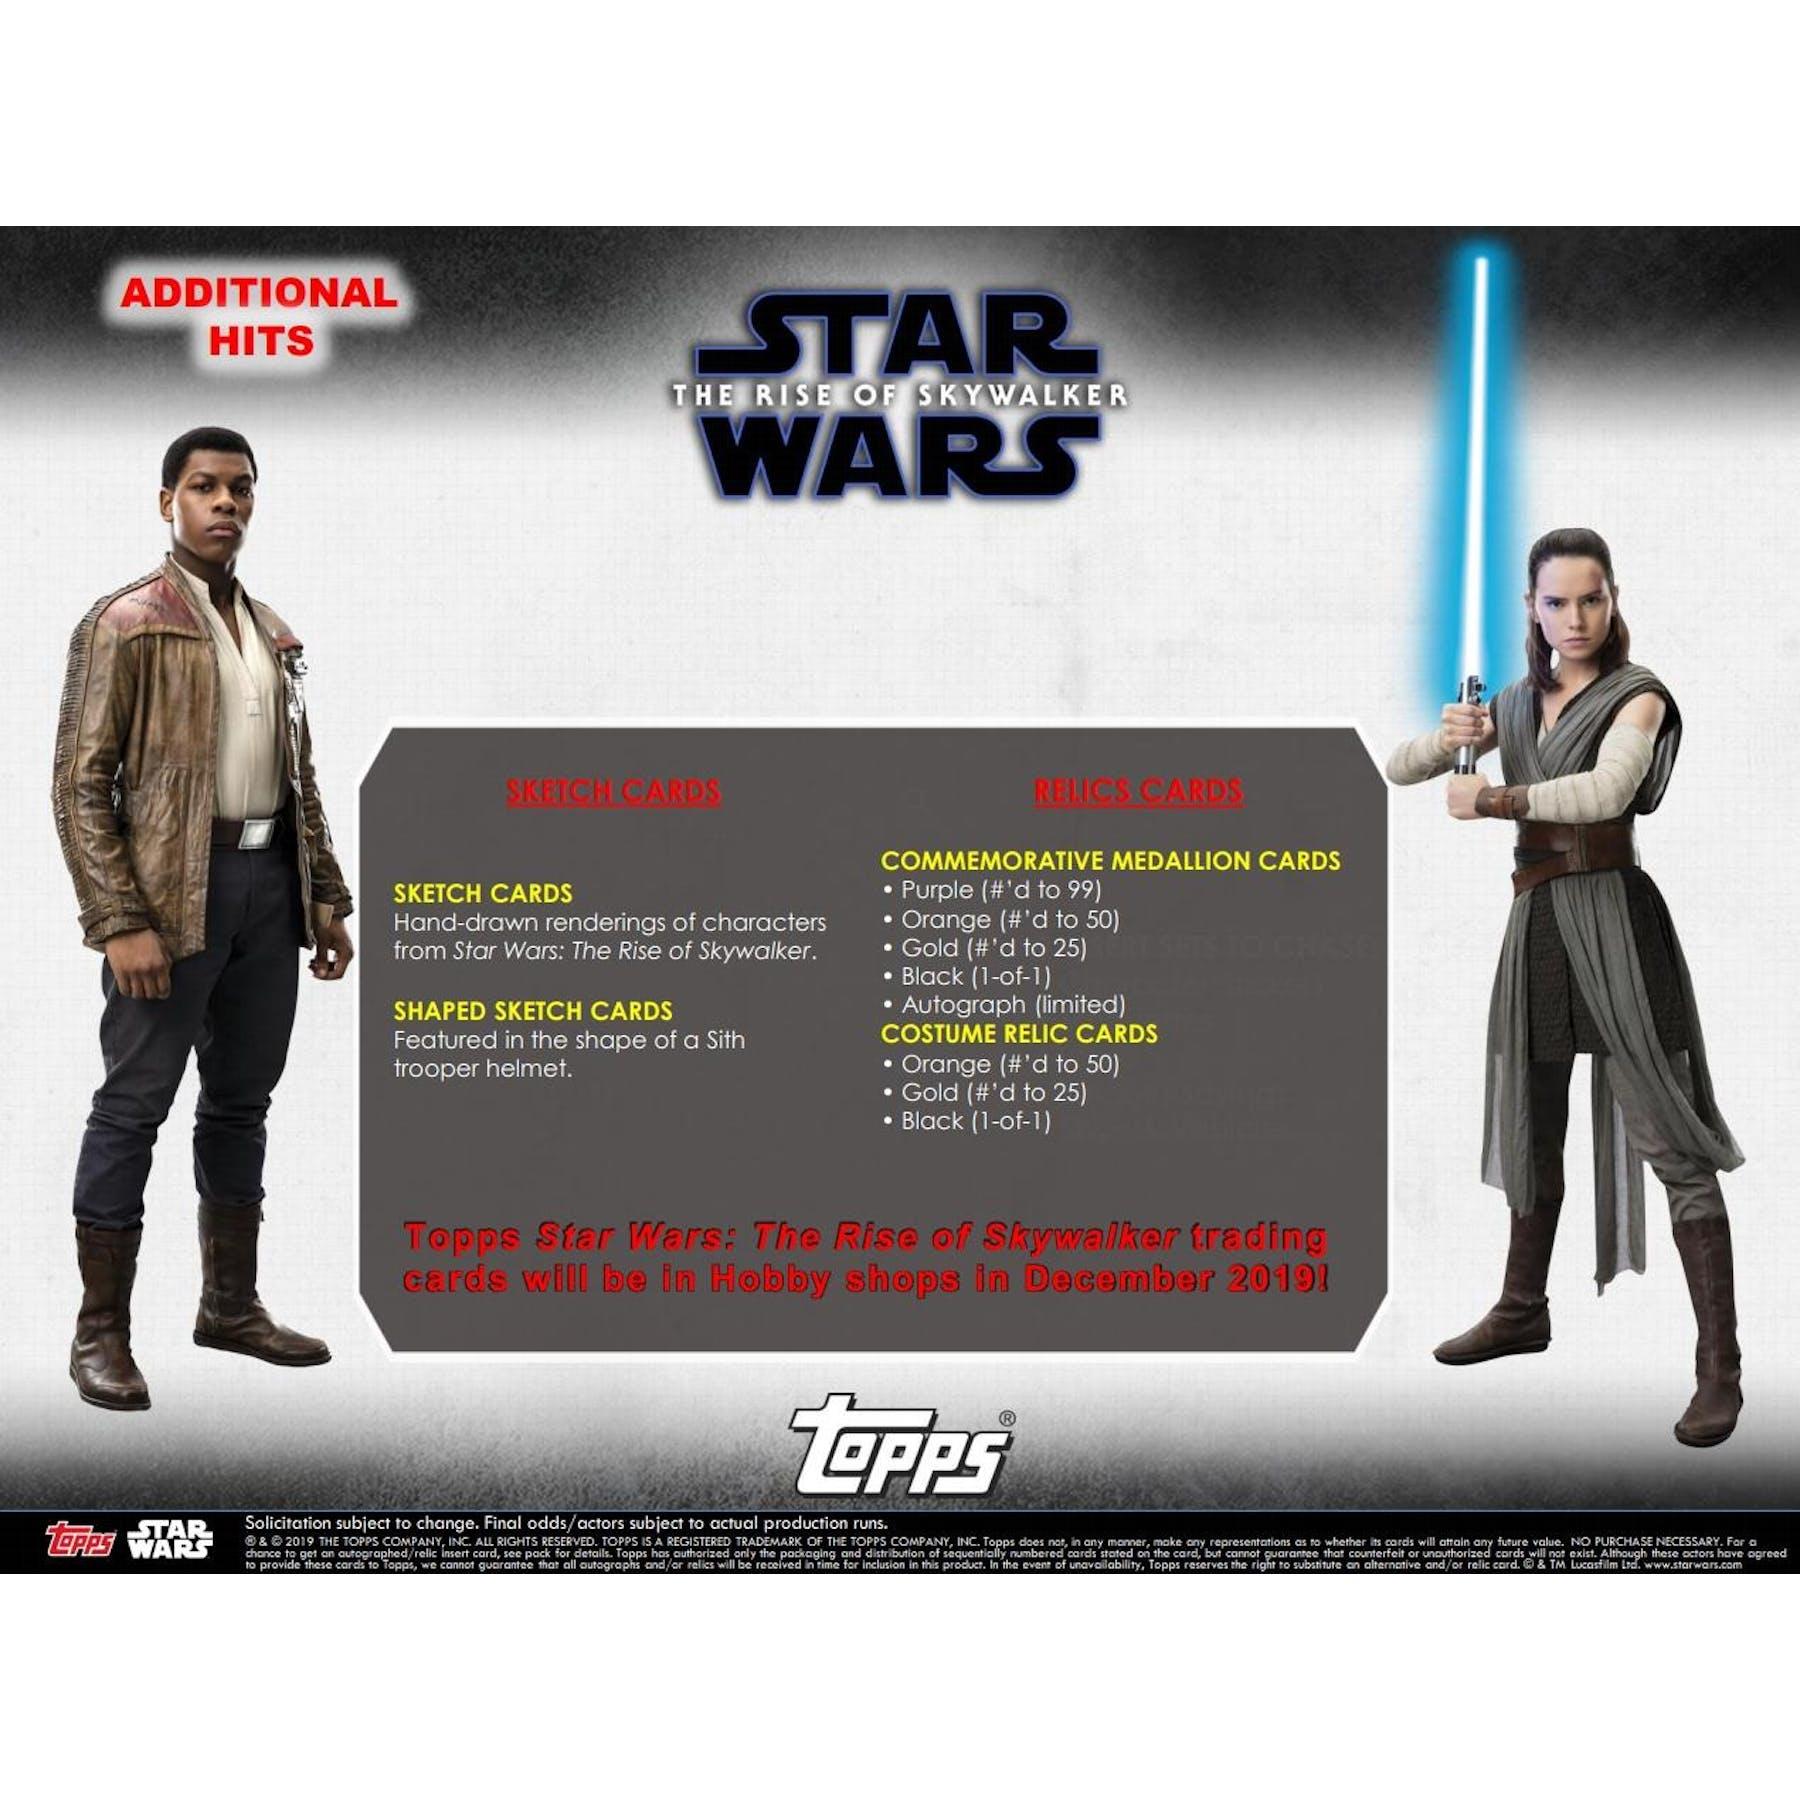 Star Wars The Rise Of Skywalker Hobby Box Topps 2019 Da Card World